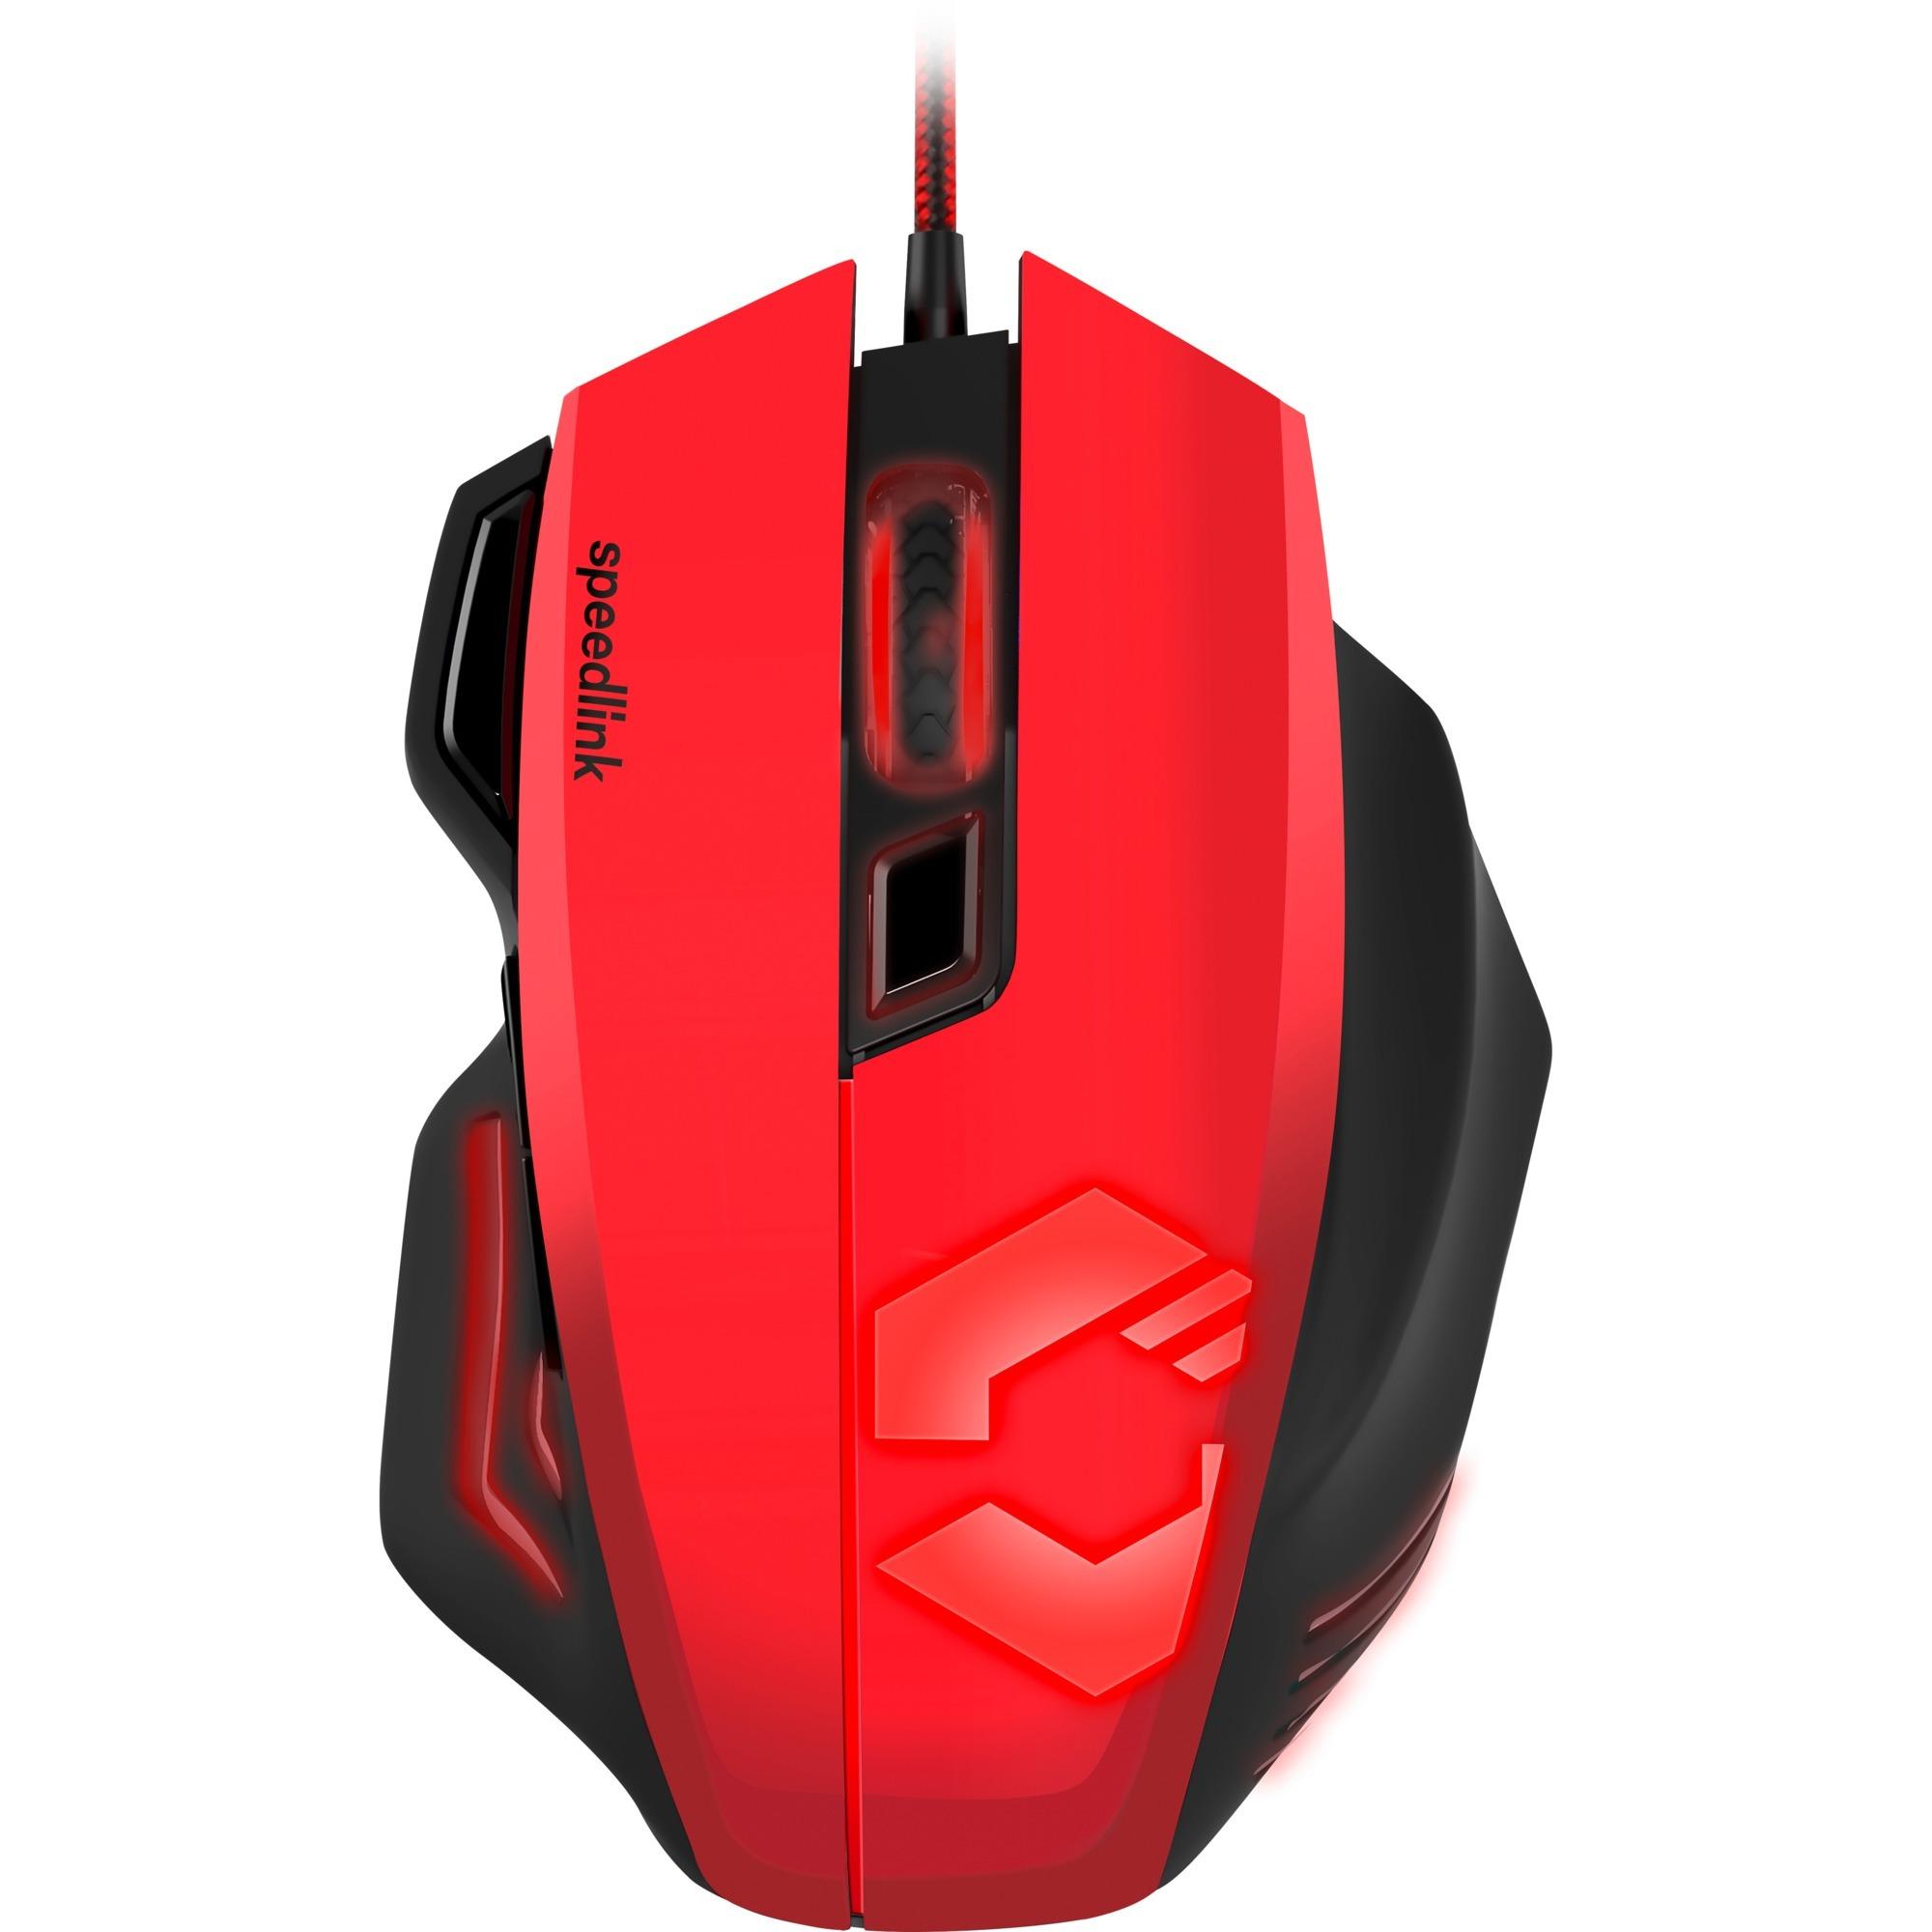 Decus Respec ratón USB Óptico 5000 DPI mano derecha